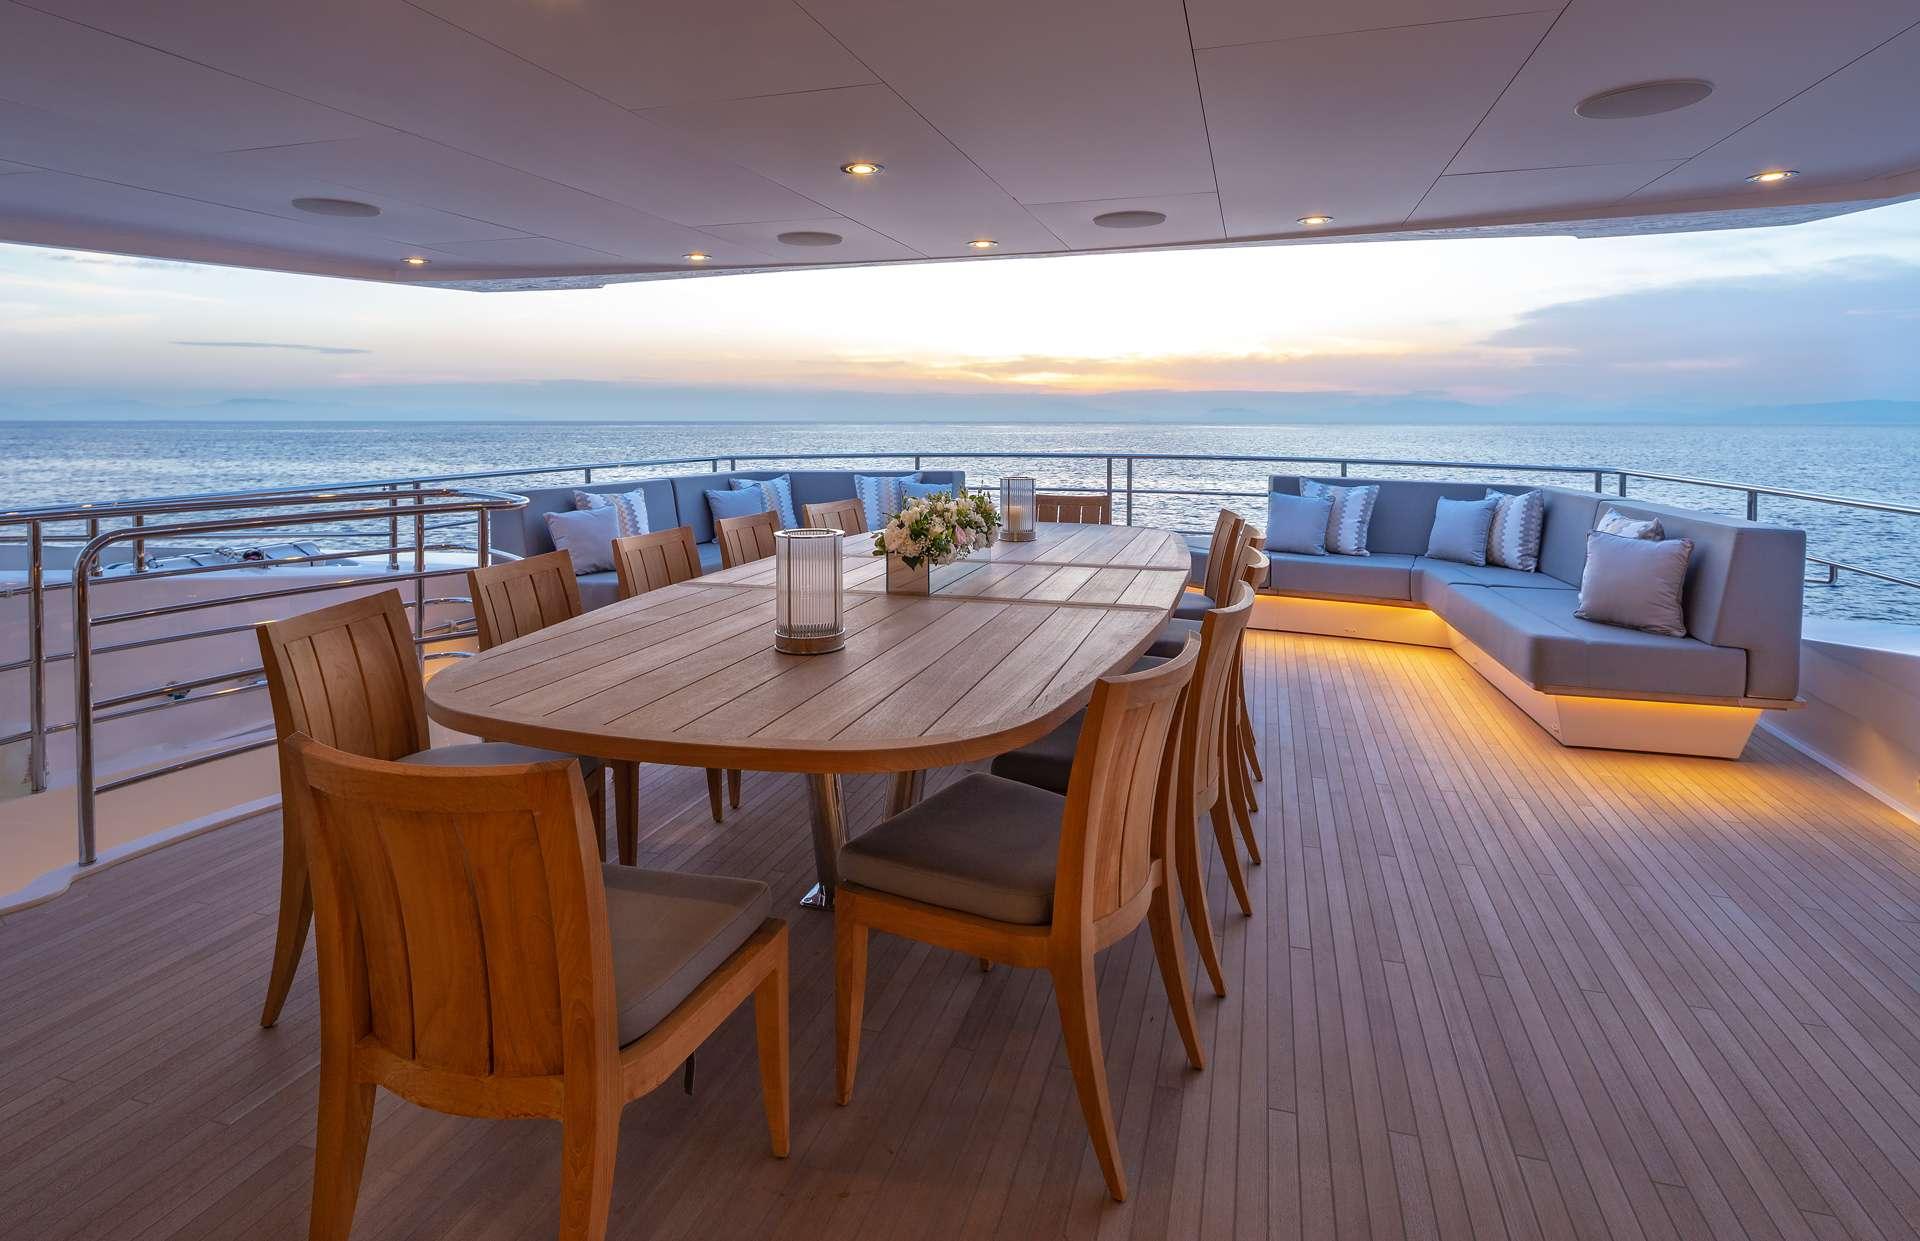 Upper deck Dining /Lounge area